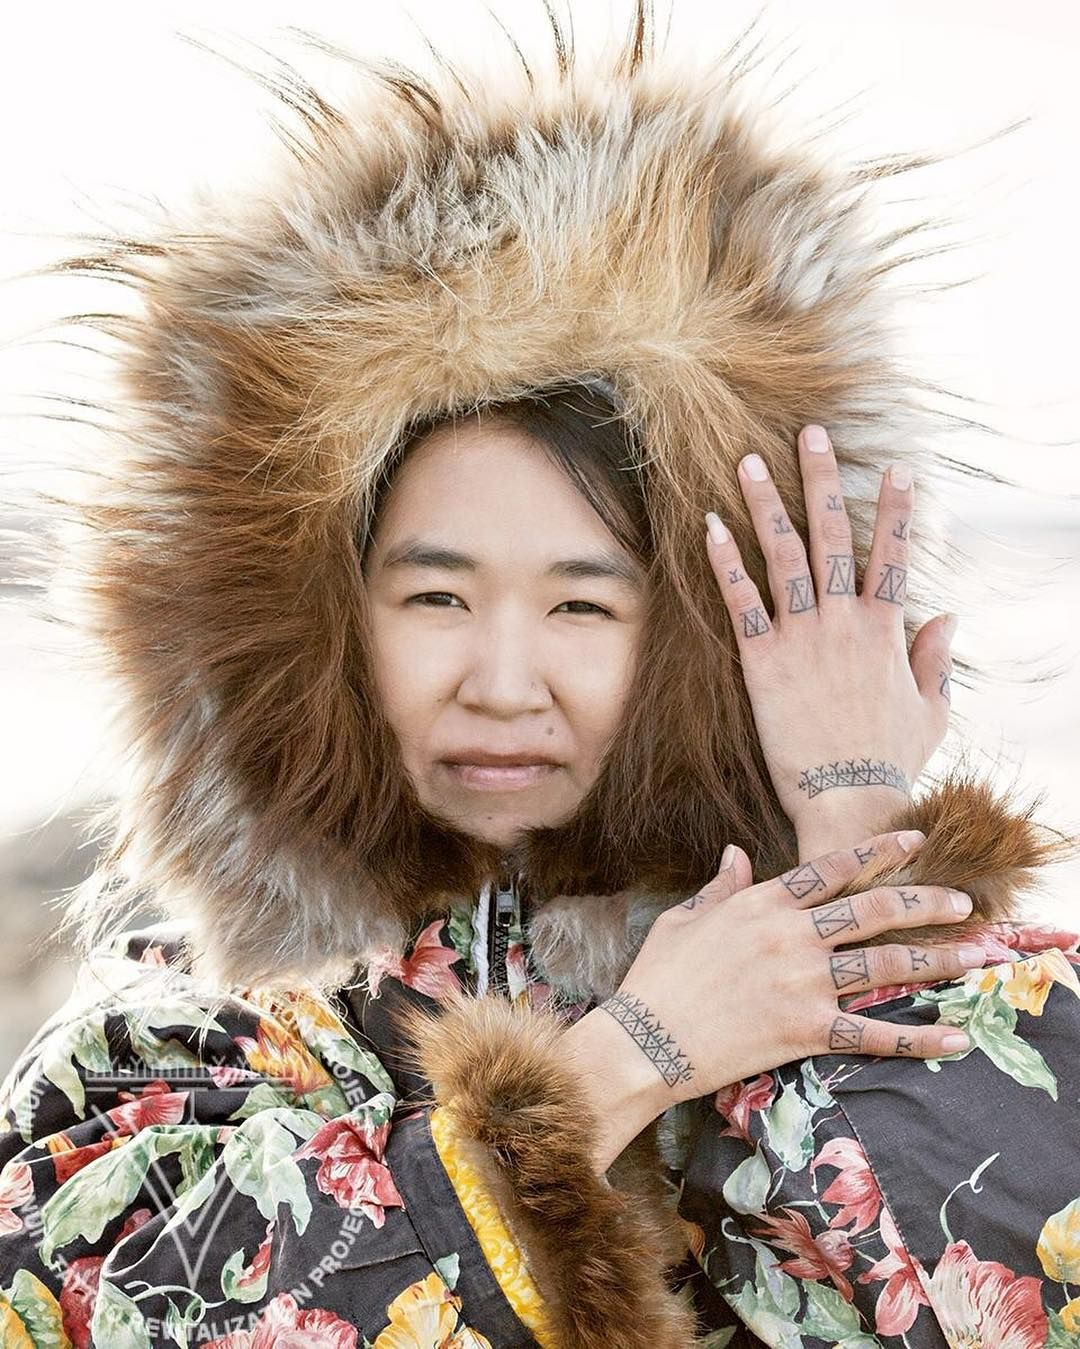 beautiful hand tattoos on my cousin mary nunavut inuk inuit